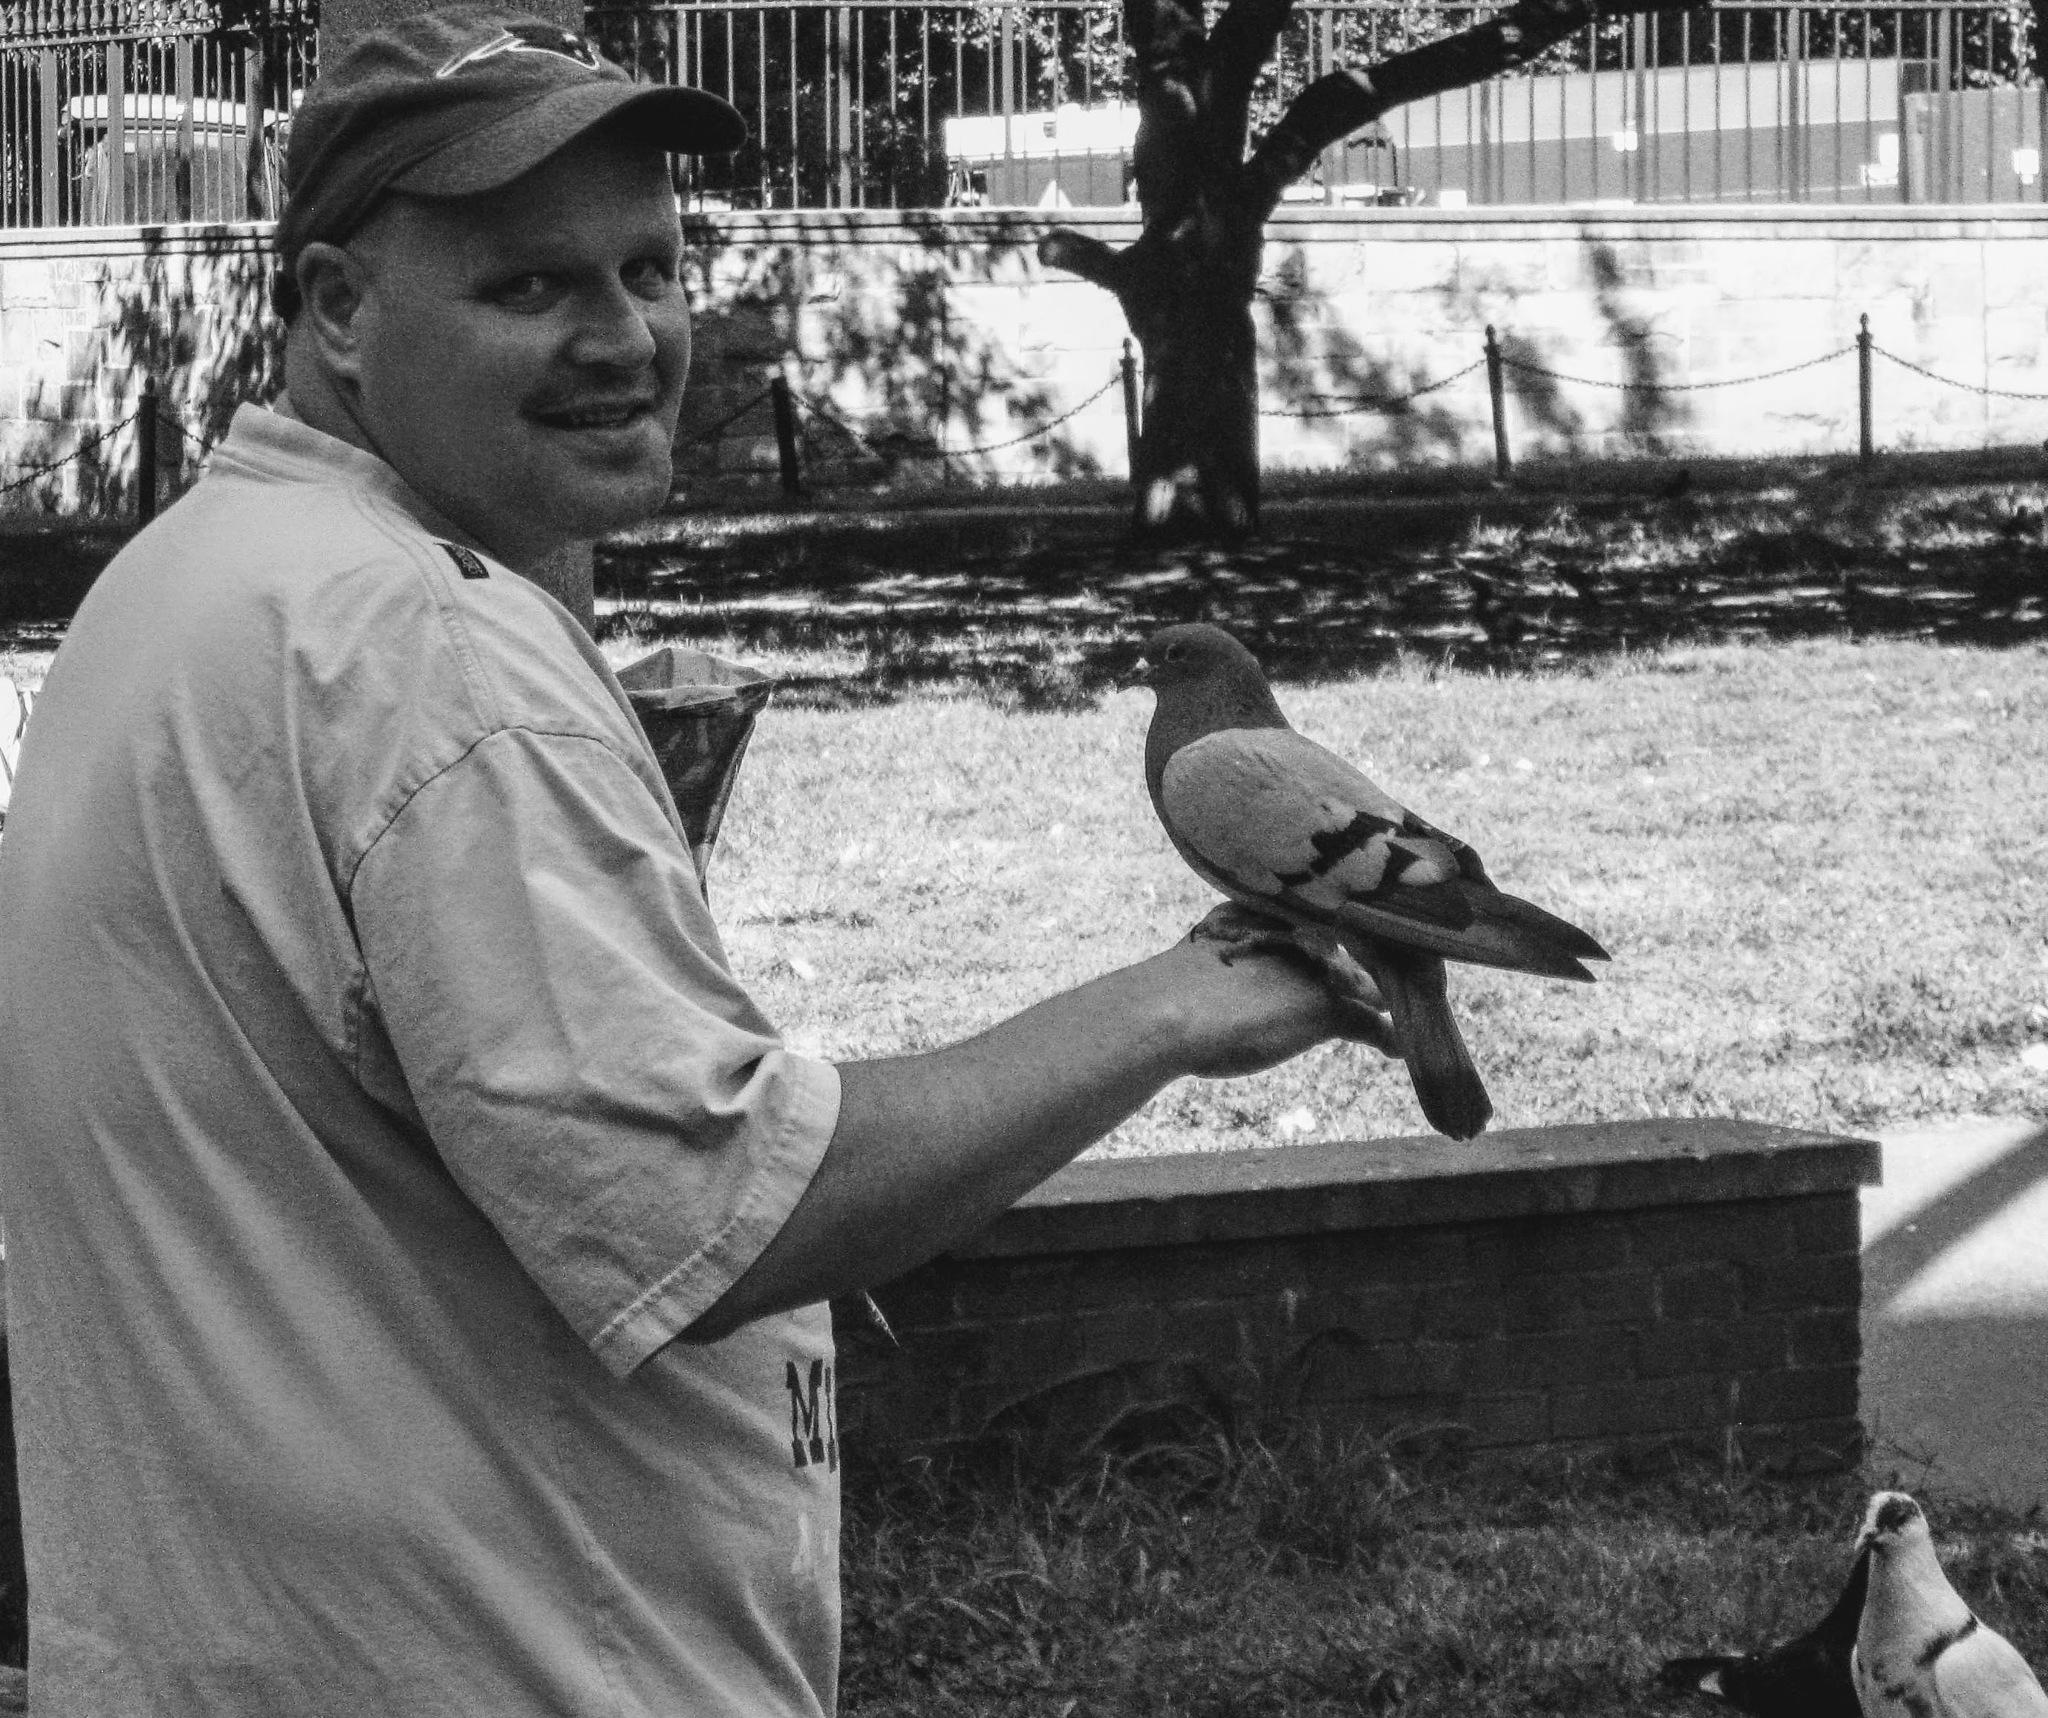 ...birdman of Beantown... by jediknight